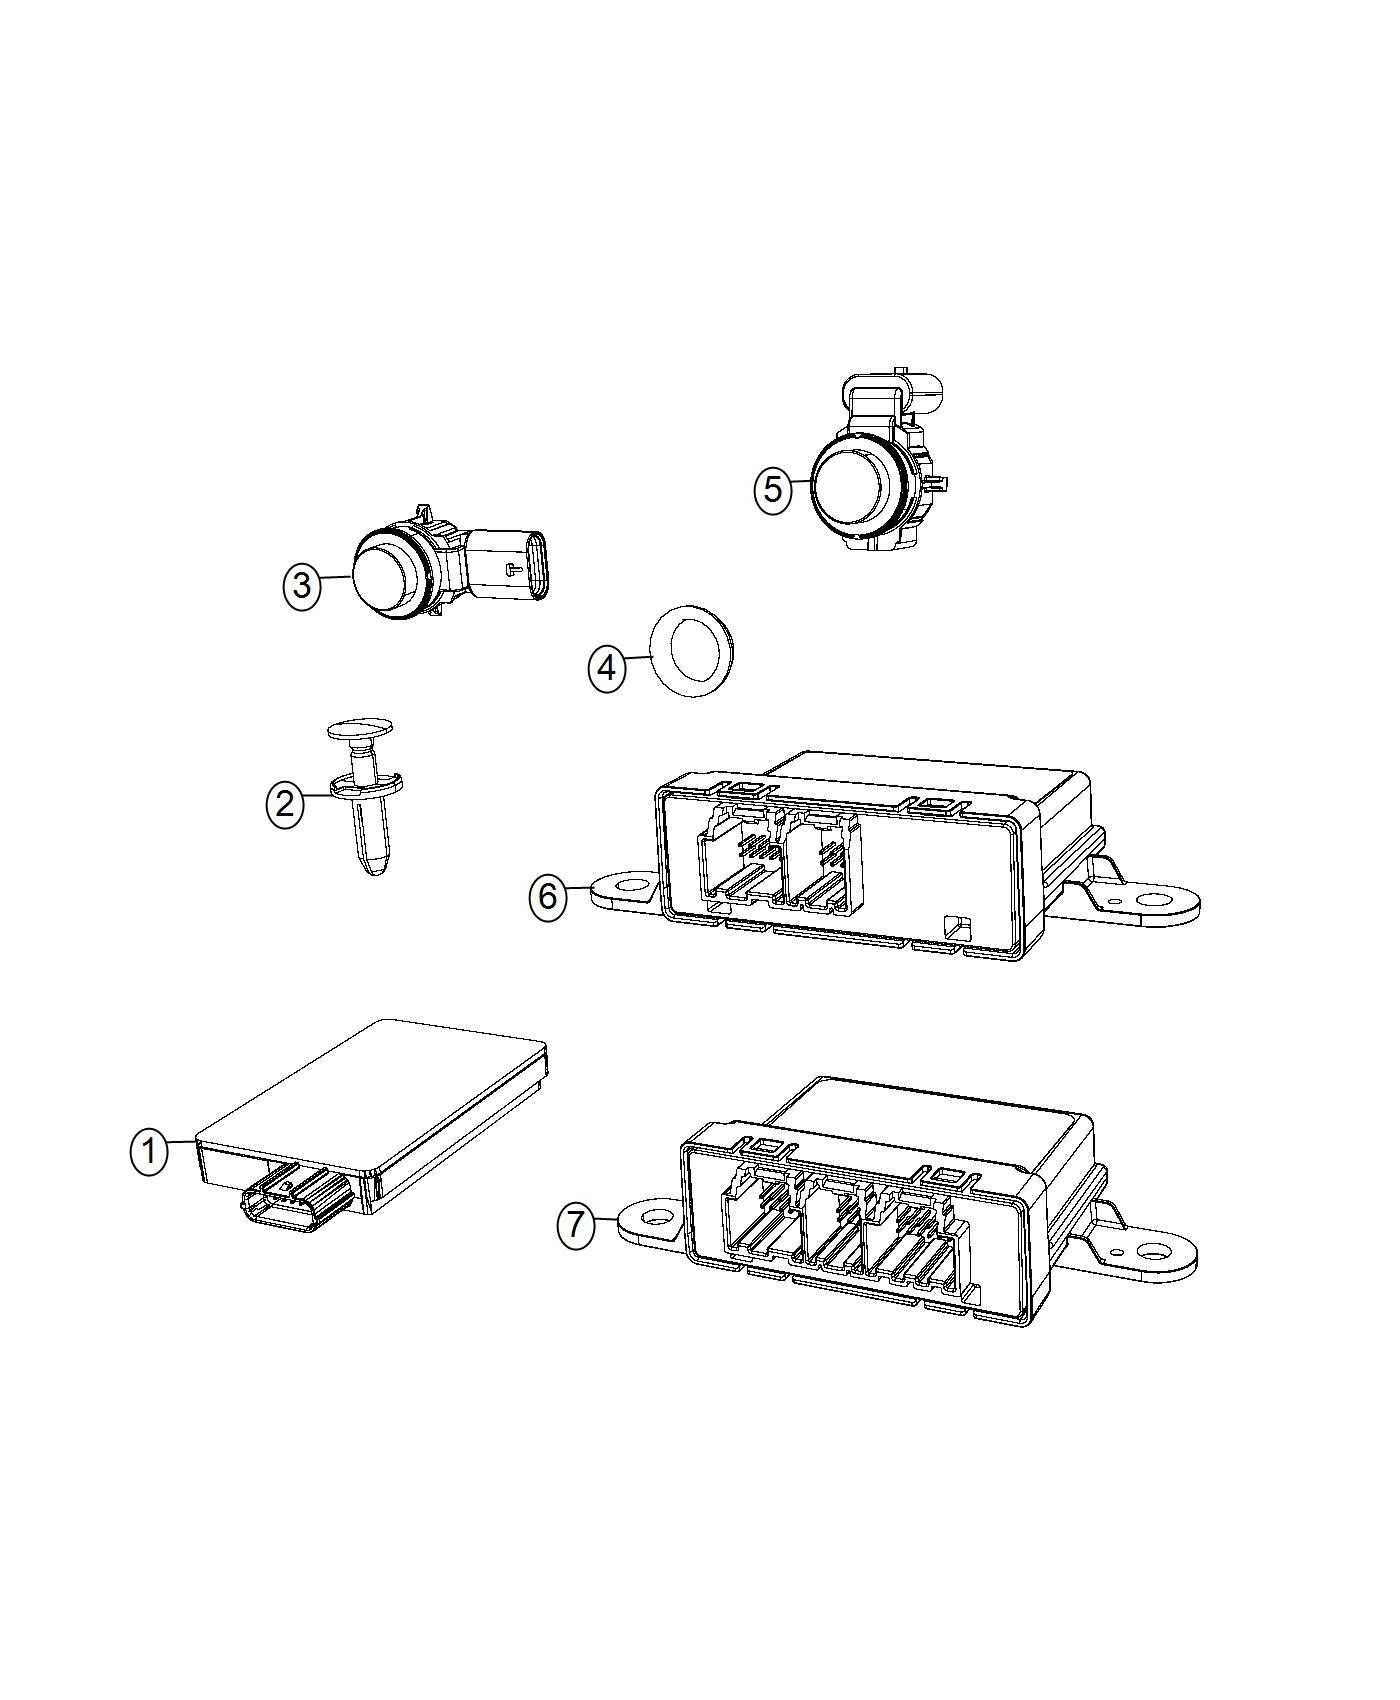 Dodge Challenger Exhaust System Diagram